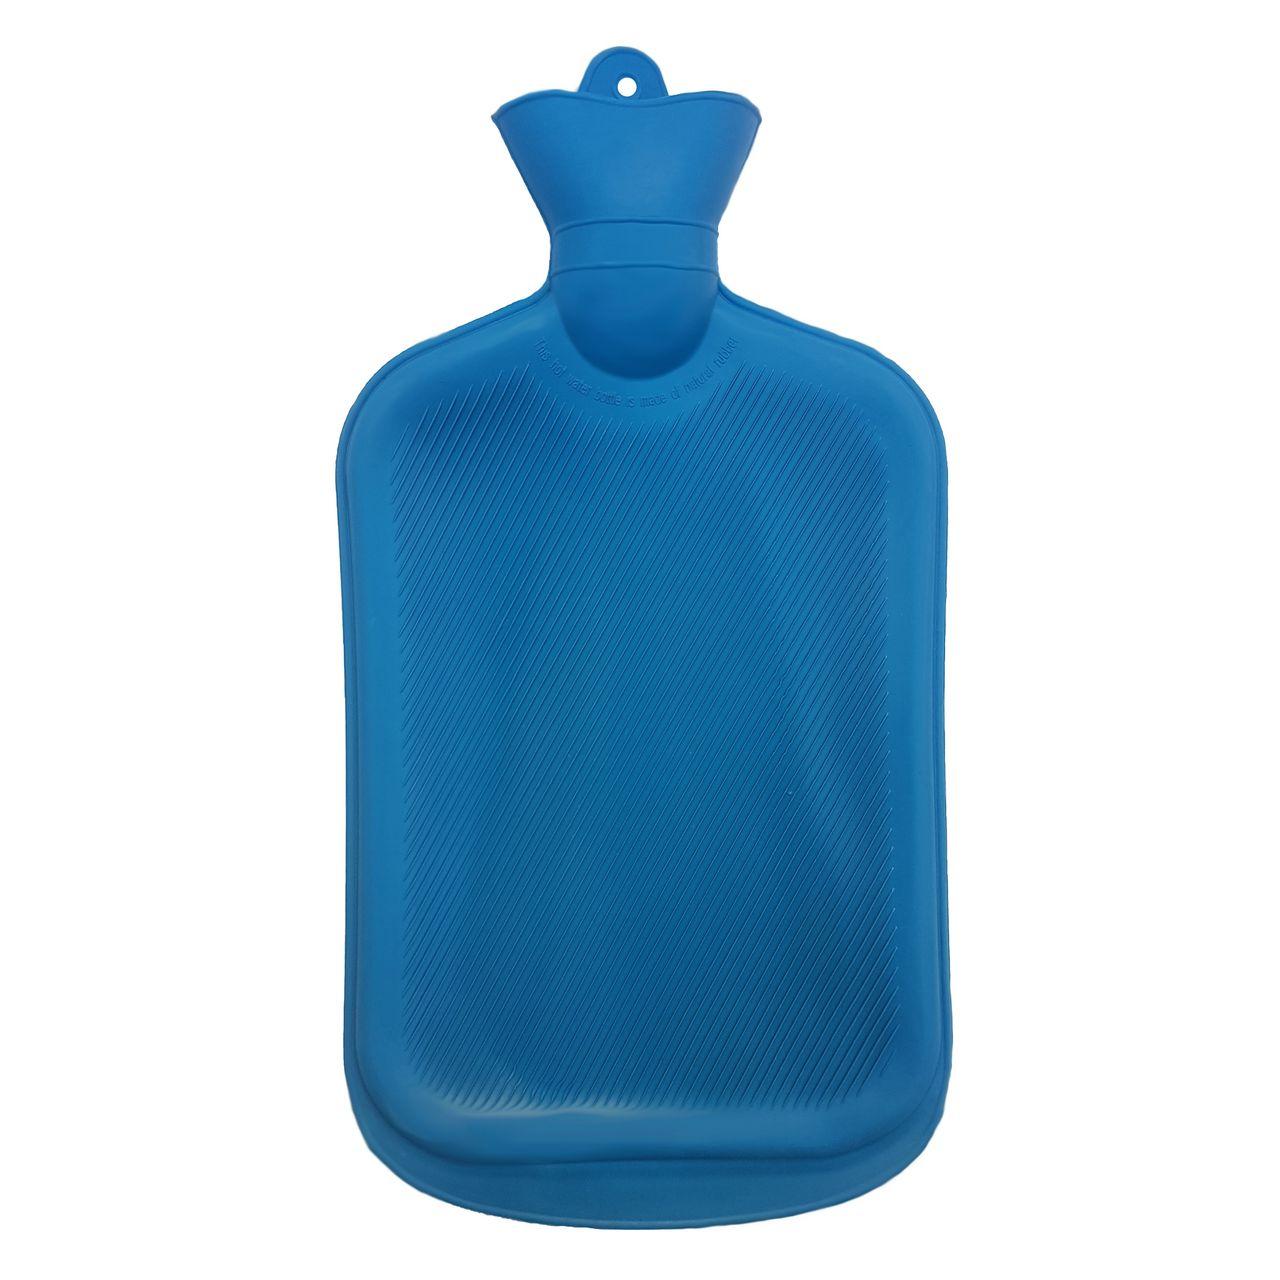 کیسه آب گرم فونجی مدل 0439 کد 14